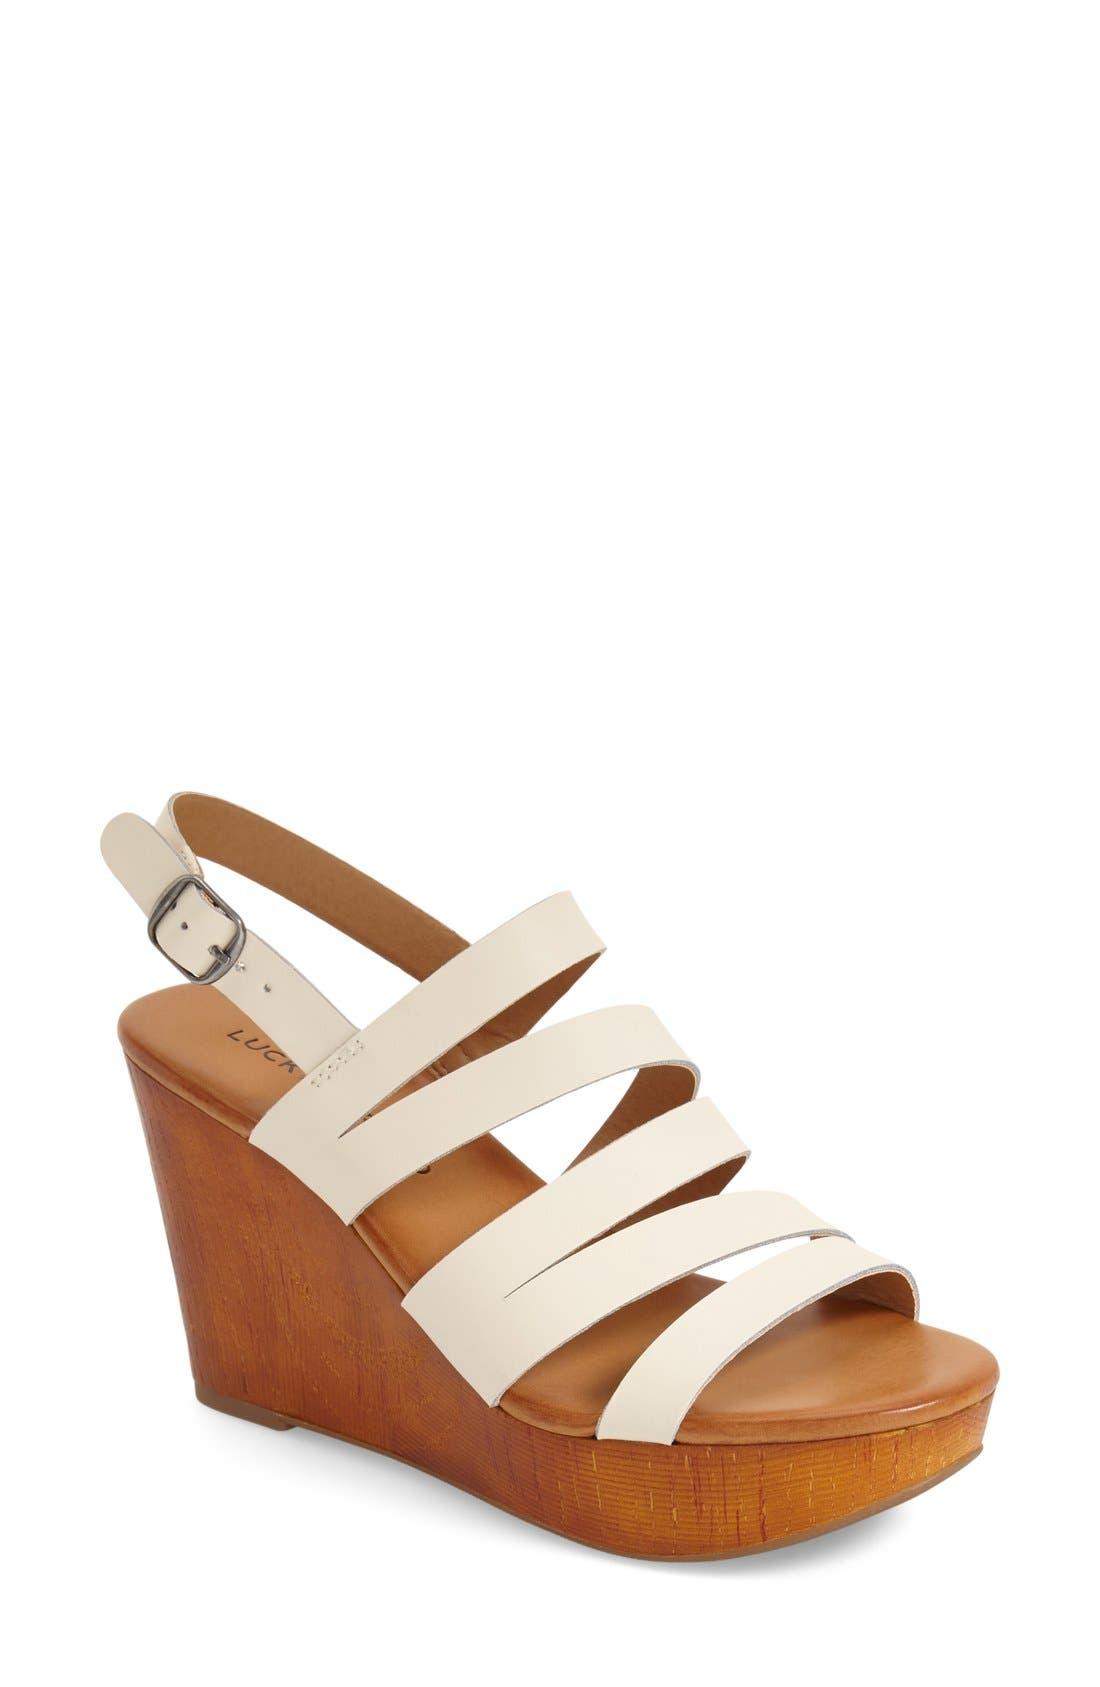 Main Image - Lucky Brand 'Marinaa' Wedge Sandal (Women)